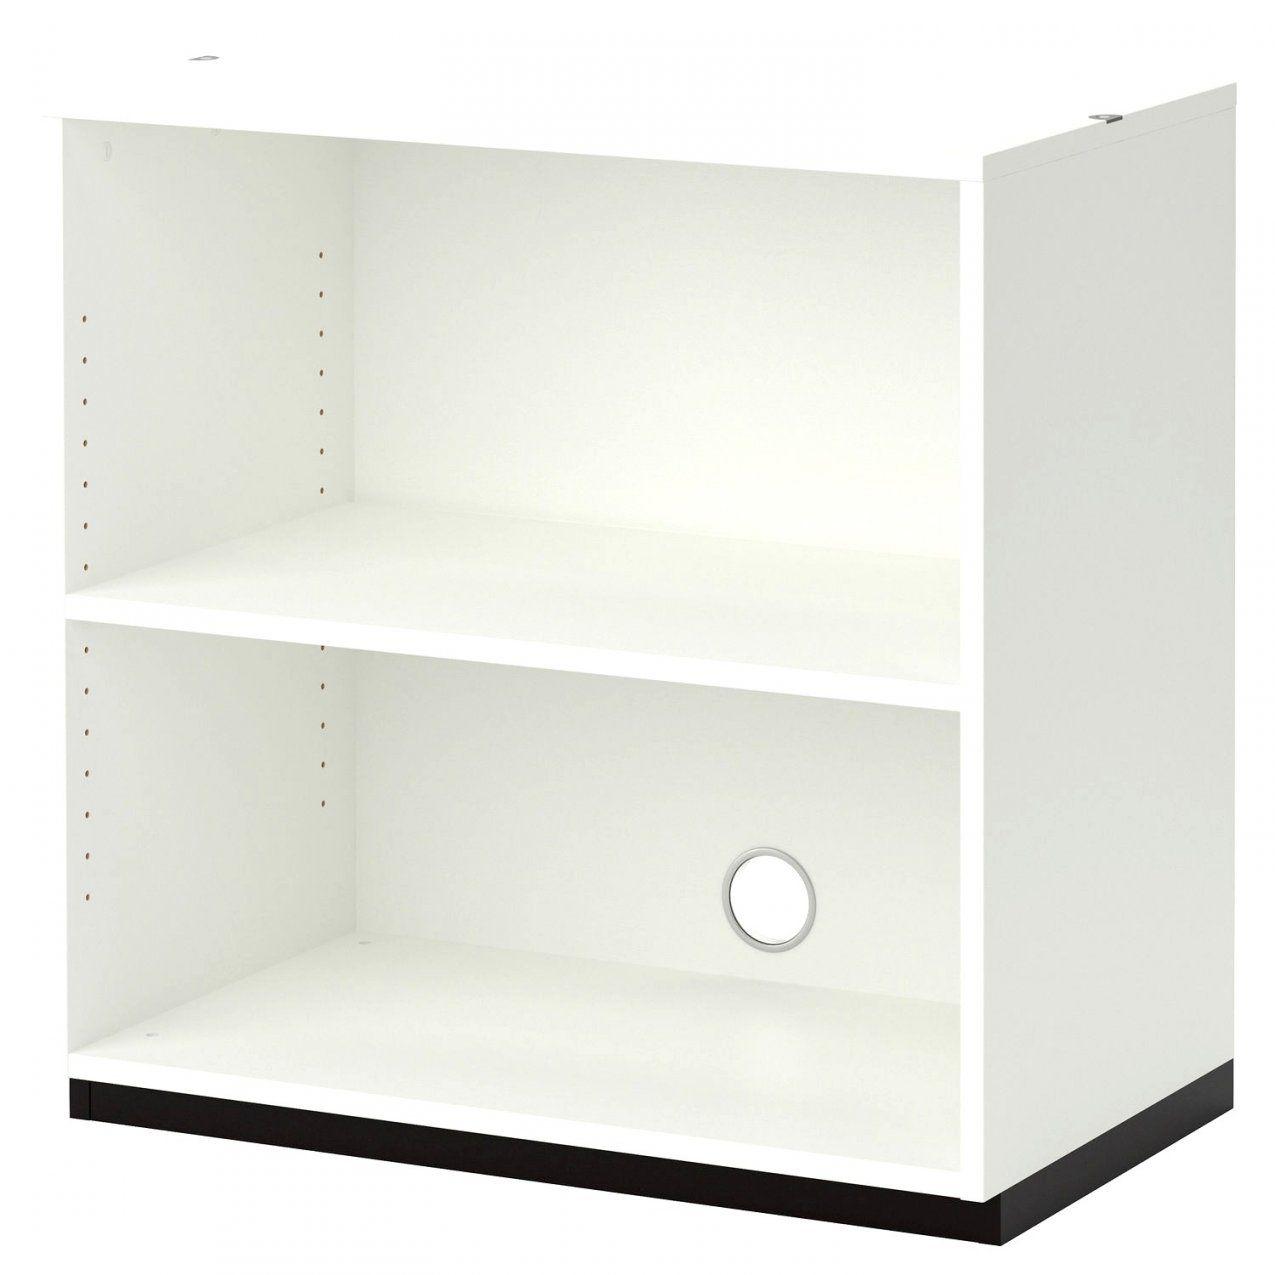 Ikea Keukenkast 50 Cm Breed In Mooi Foto's Van Galant Shelf Unit von Spülenunterschrank 50 Cm Ikea Bild